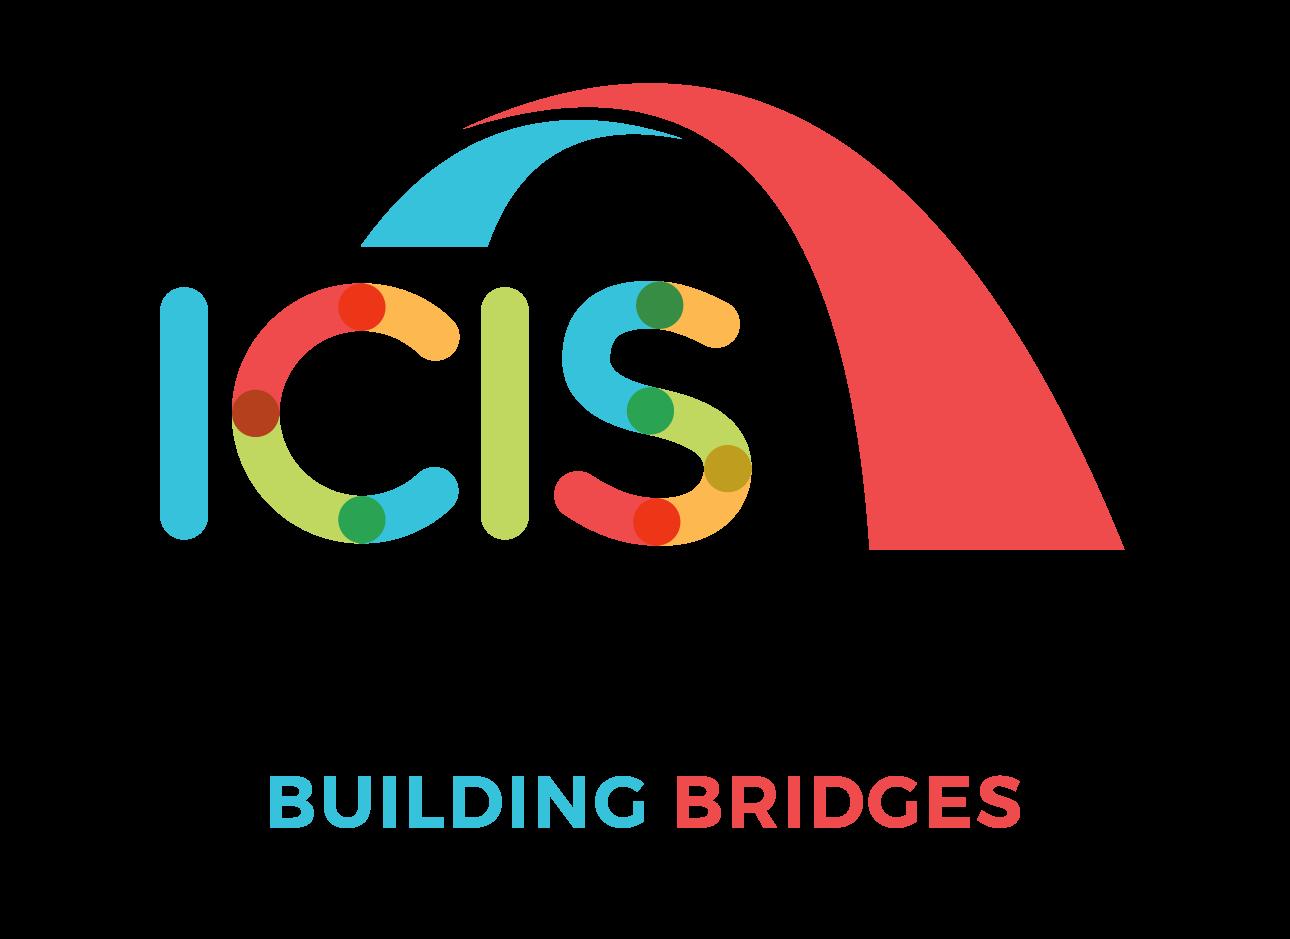 ICIS 2018 logo || Databrary